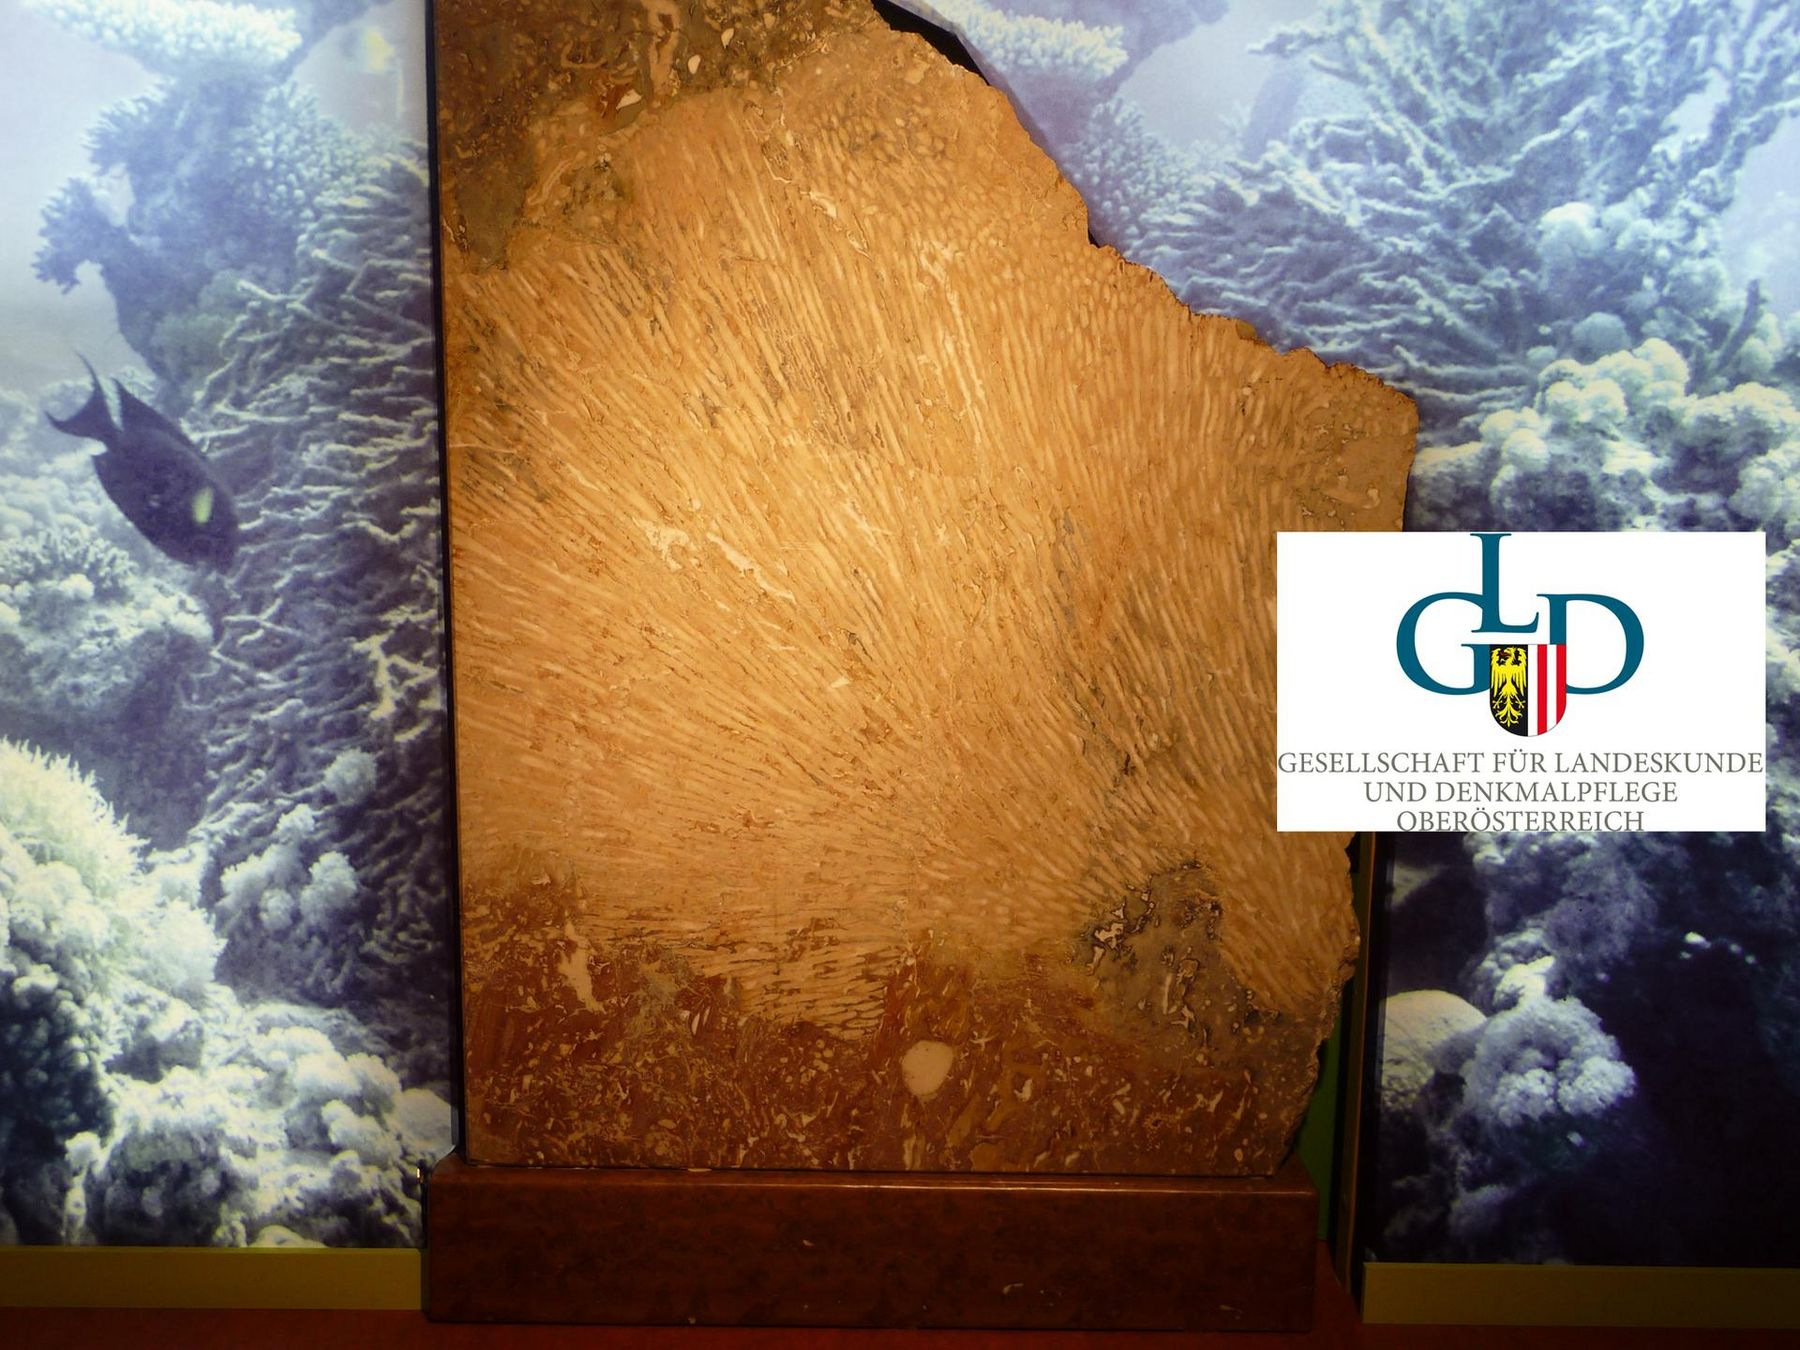 AR Korallenstock mitGDLLogo